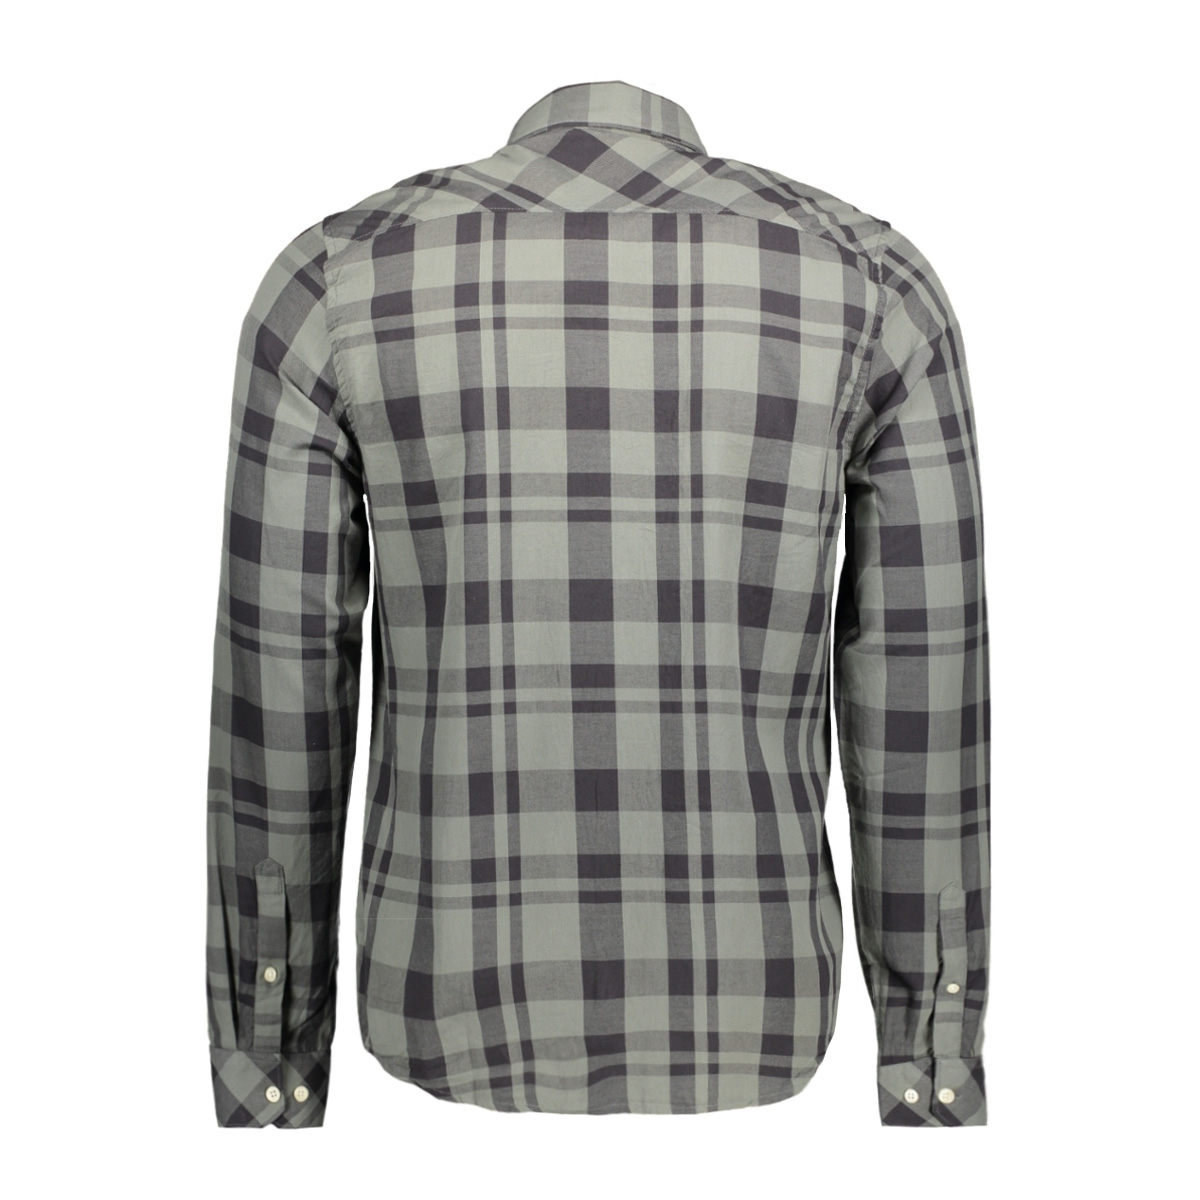 h71225 garcia overhemd 2289 office